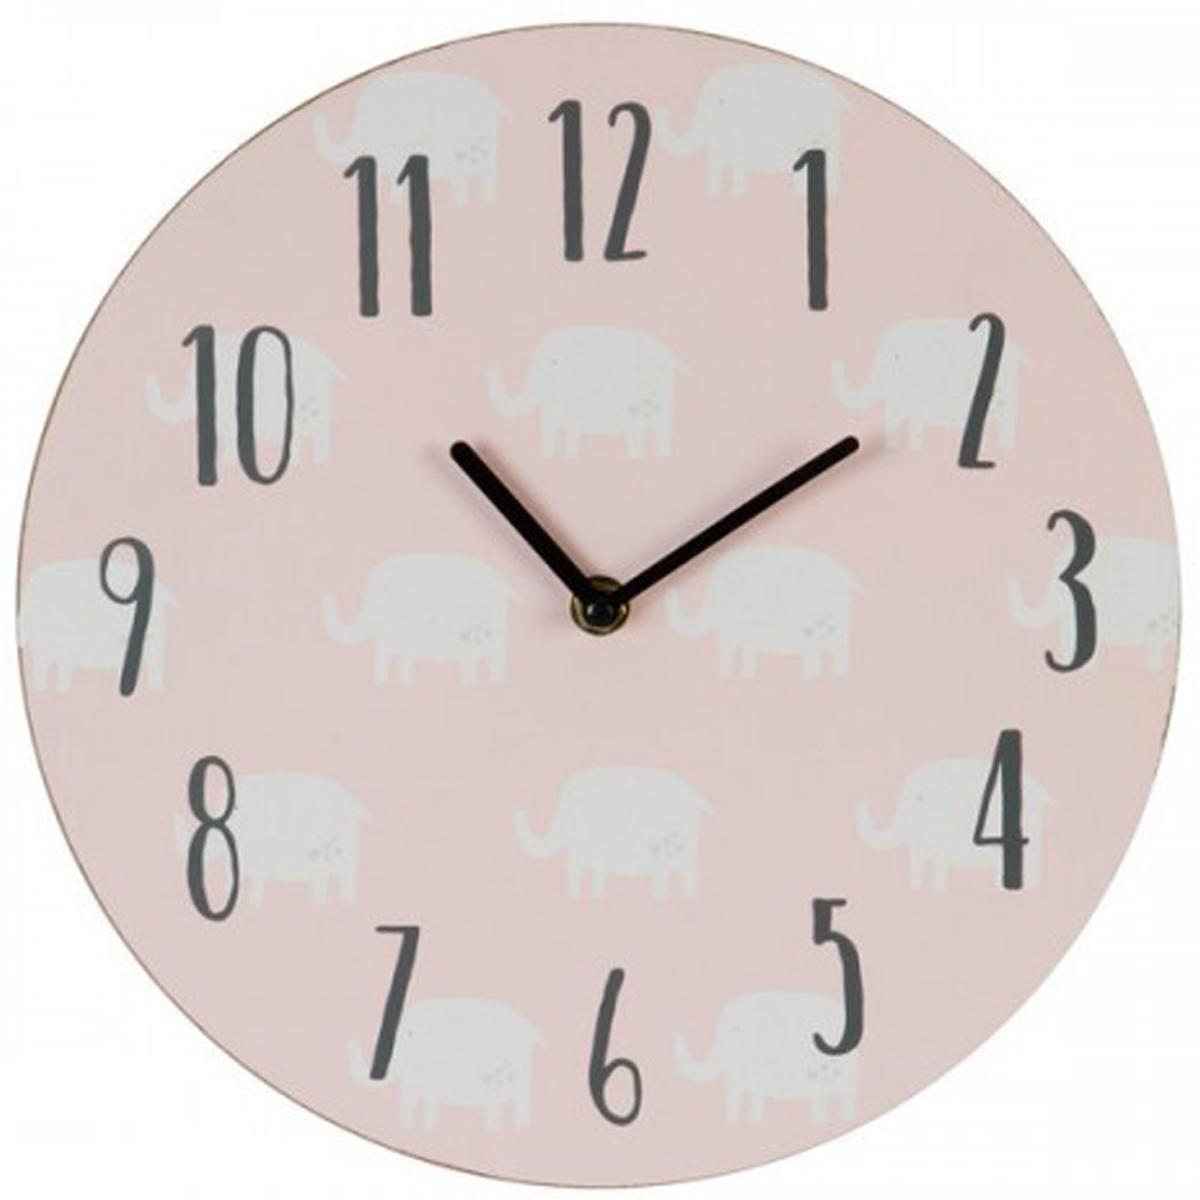 Horloge enfant bois \'Elephant\' rose - 30 cm - [Q2090]